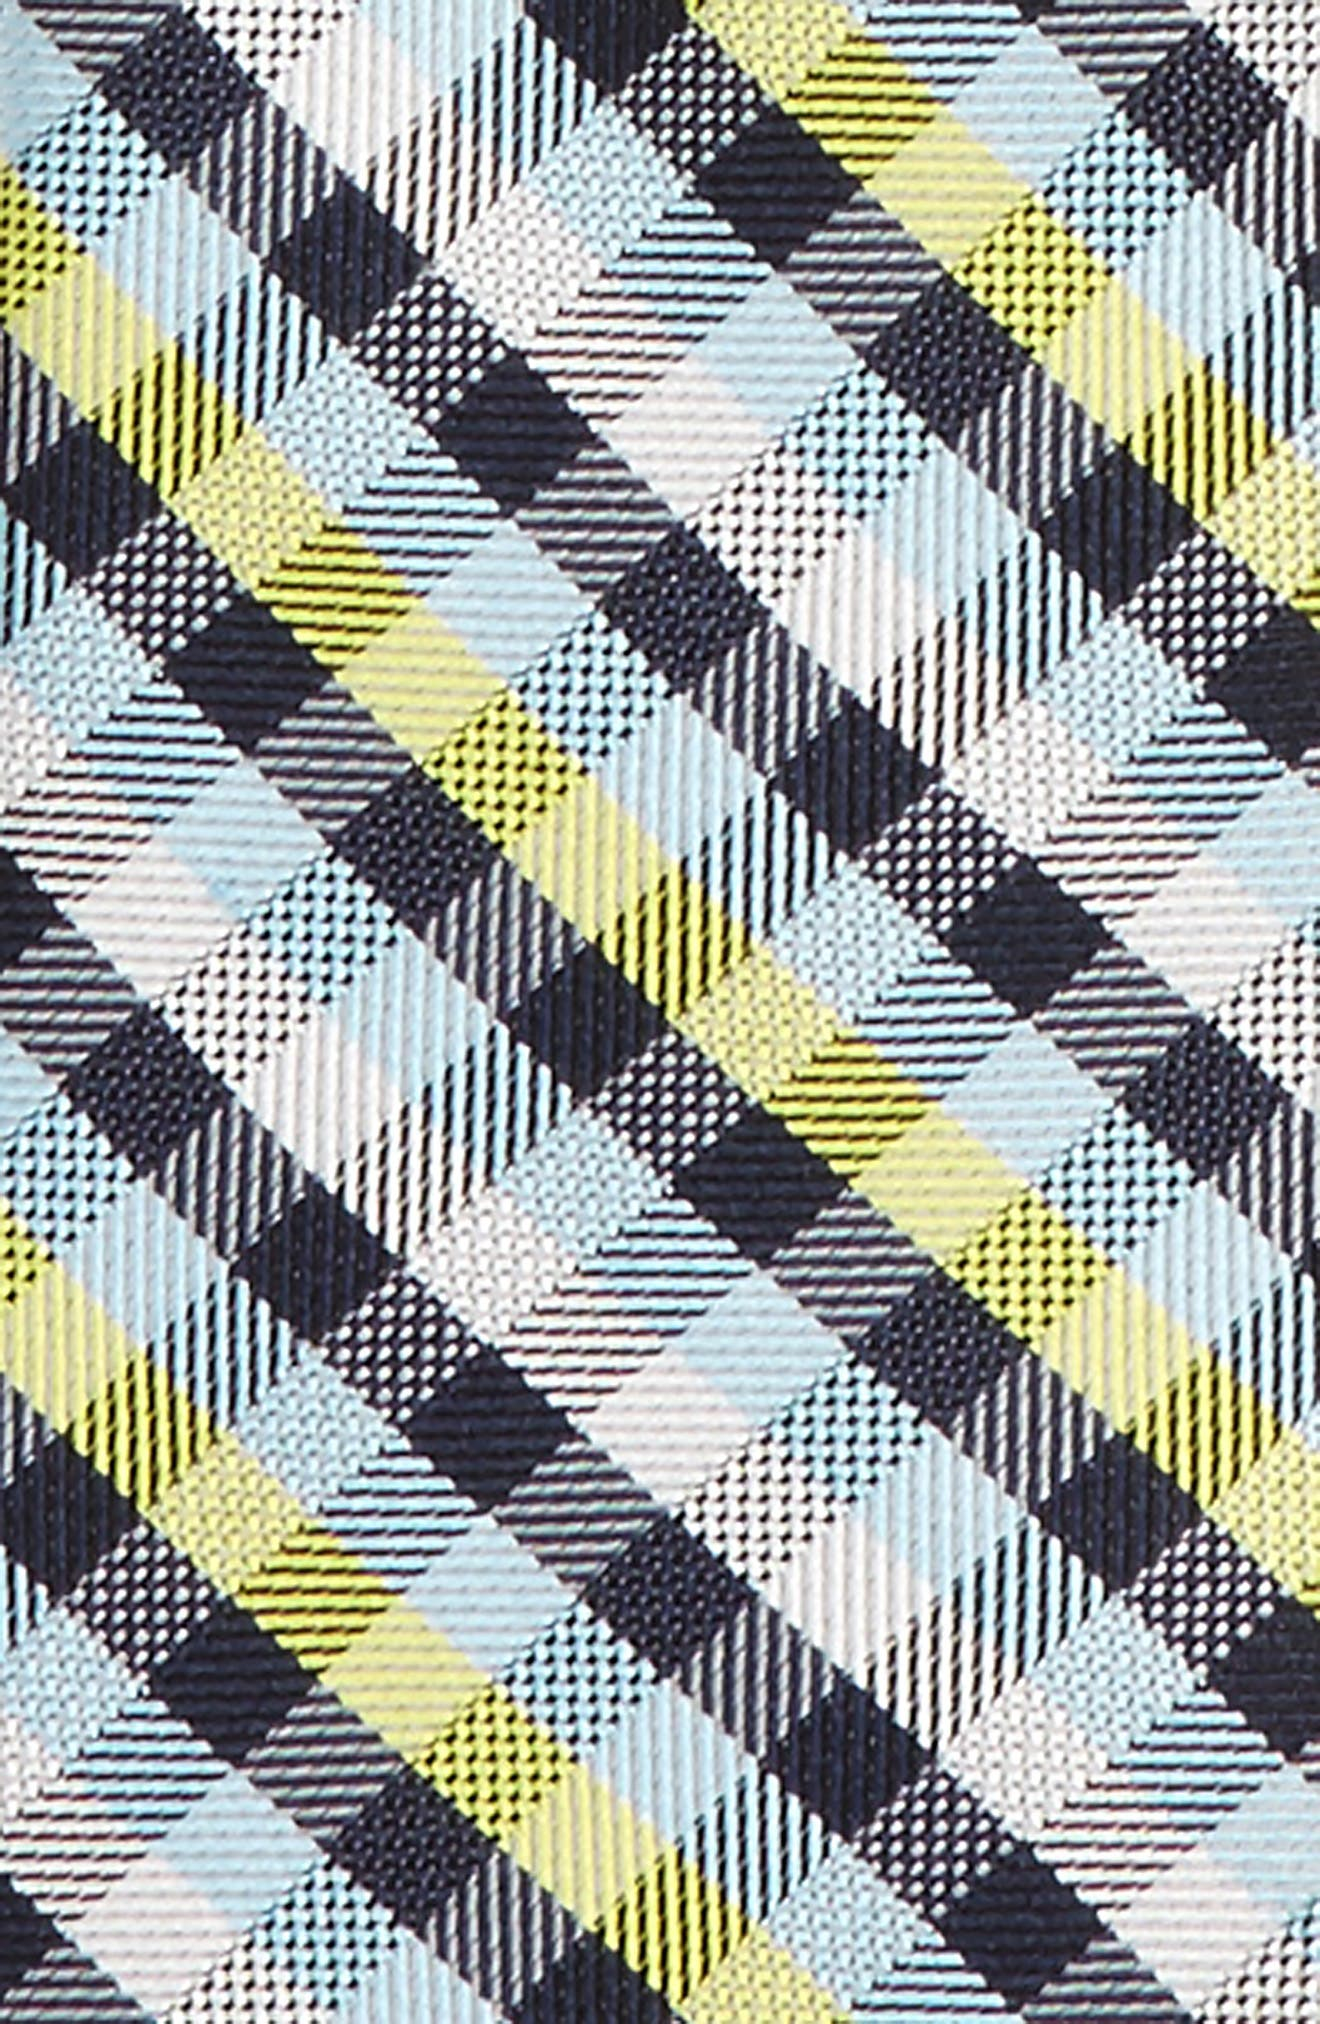 Plaid Silk Zip Tie,                             Alternate thumbnail 2, color,                             Yellow